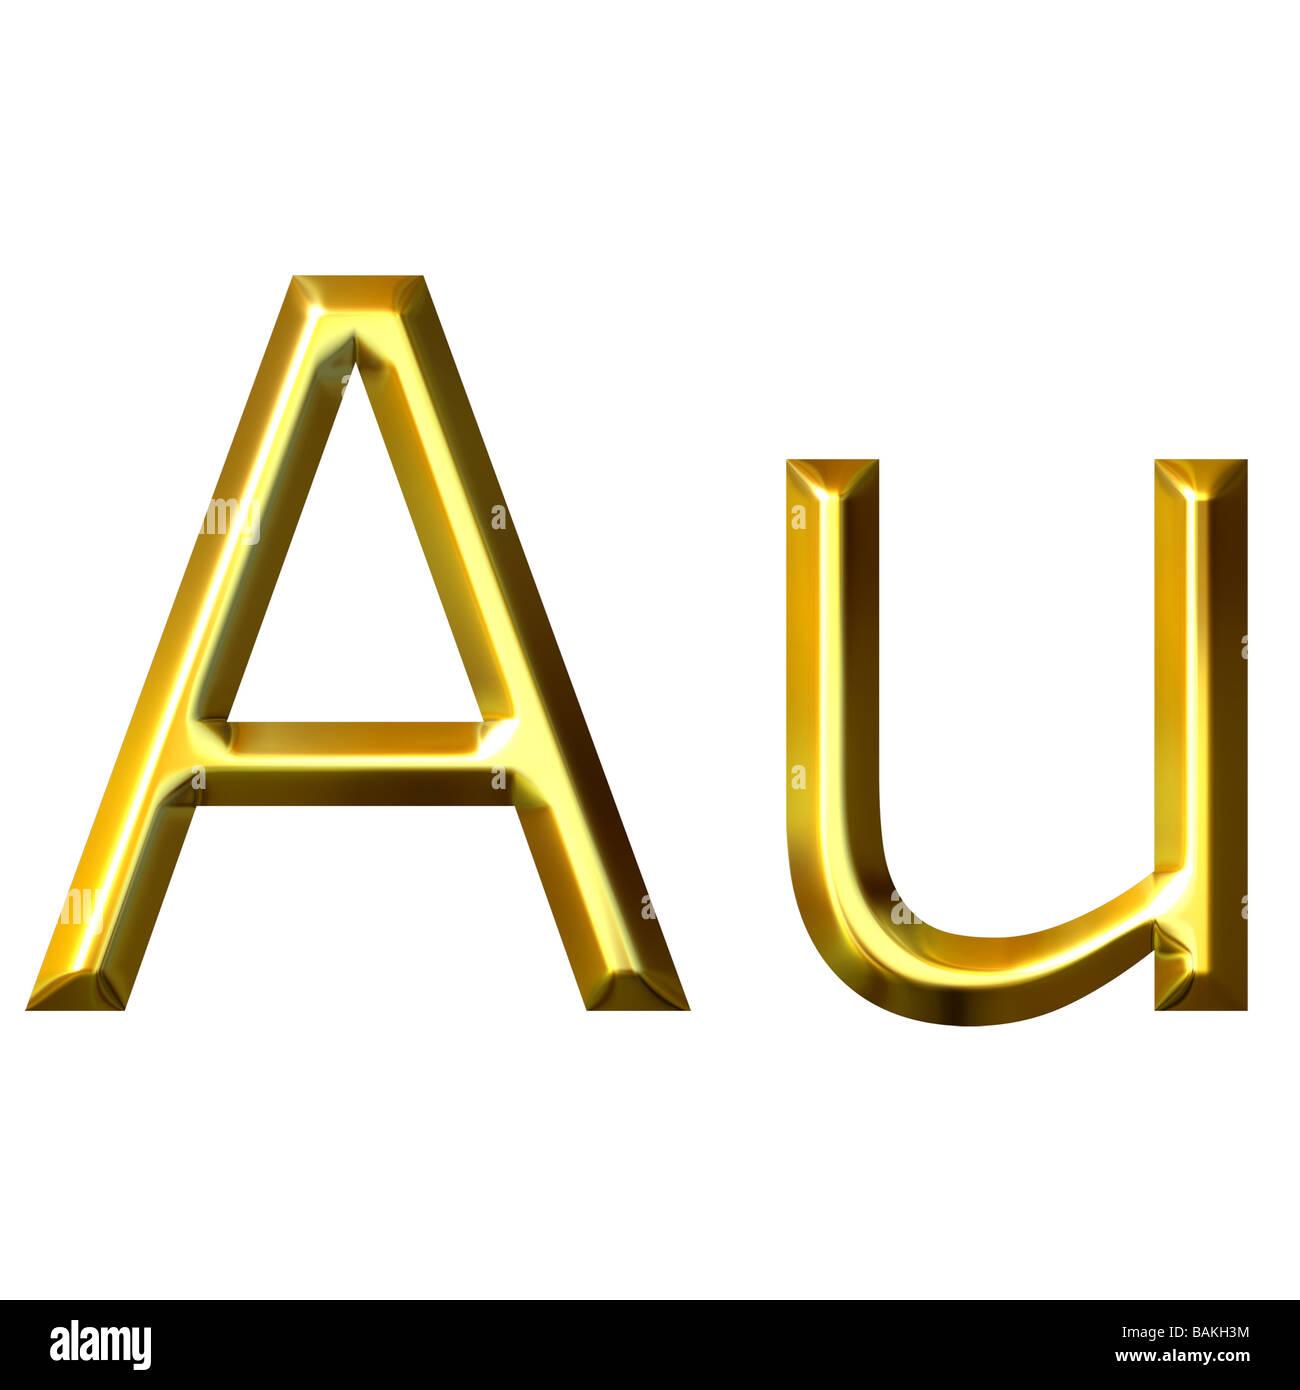 Symbol au chemical element gold stock photos symbol au chemical gold symbol stock image urtaz Gallery